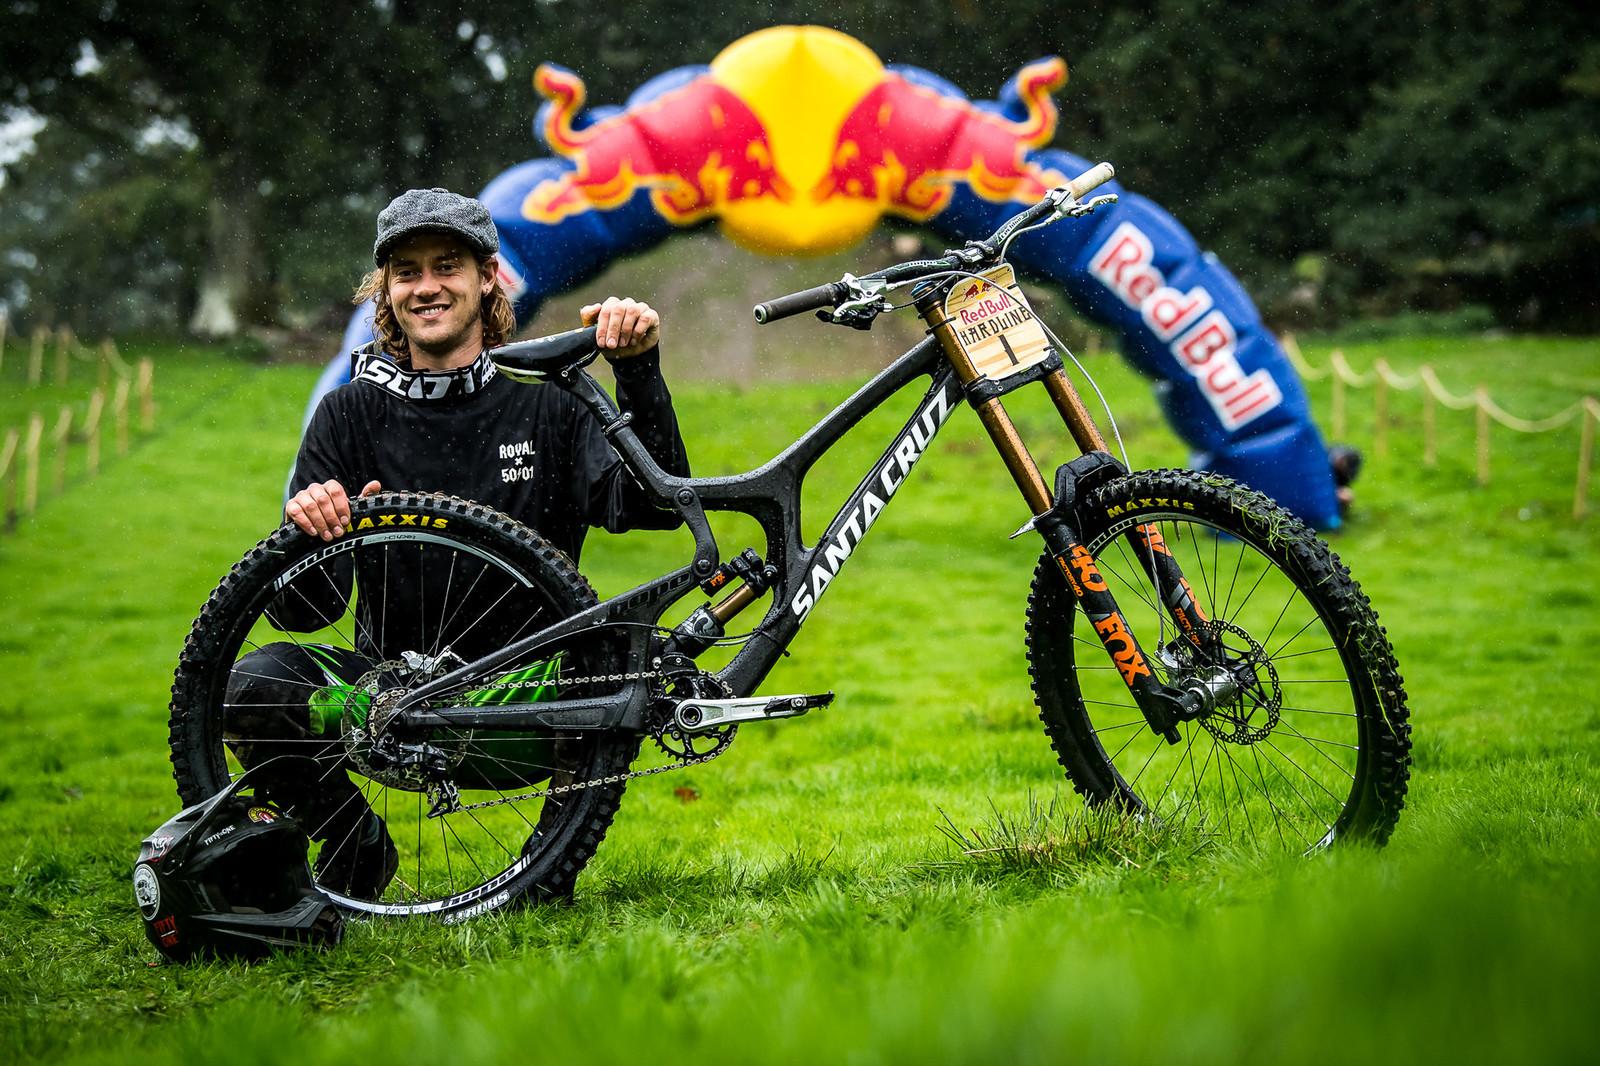 Craig Evans and His Santa Cruz V10 - Red Bull Hardline 2018 Riders and Bikes - Mountain Biking Pictures - Vital MTB